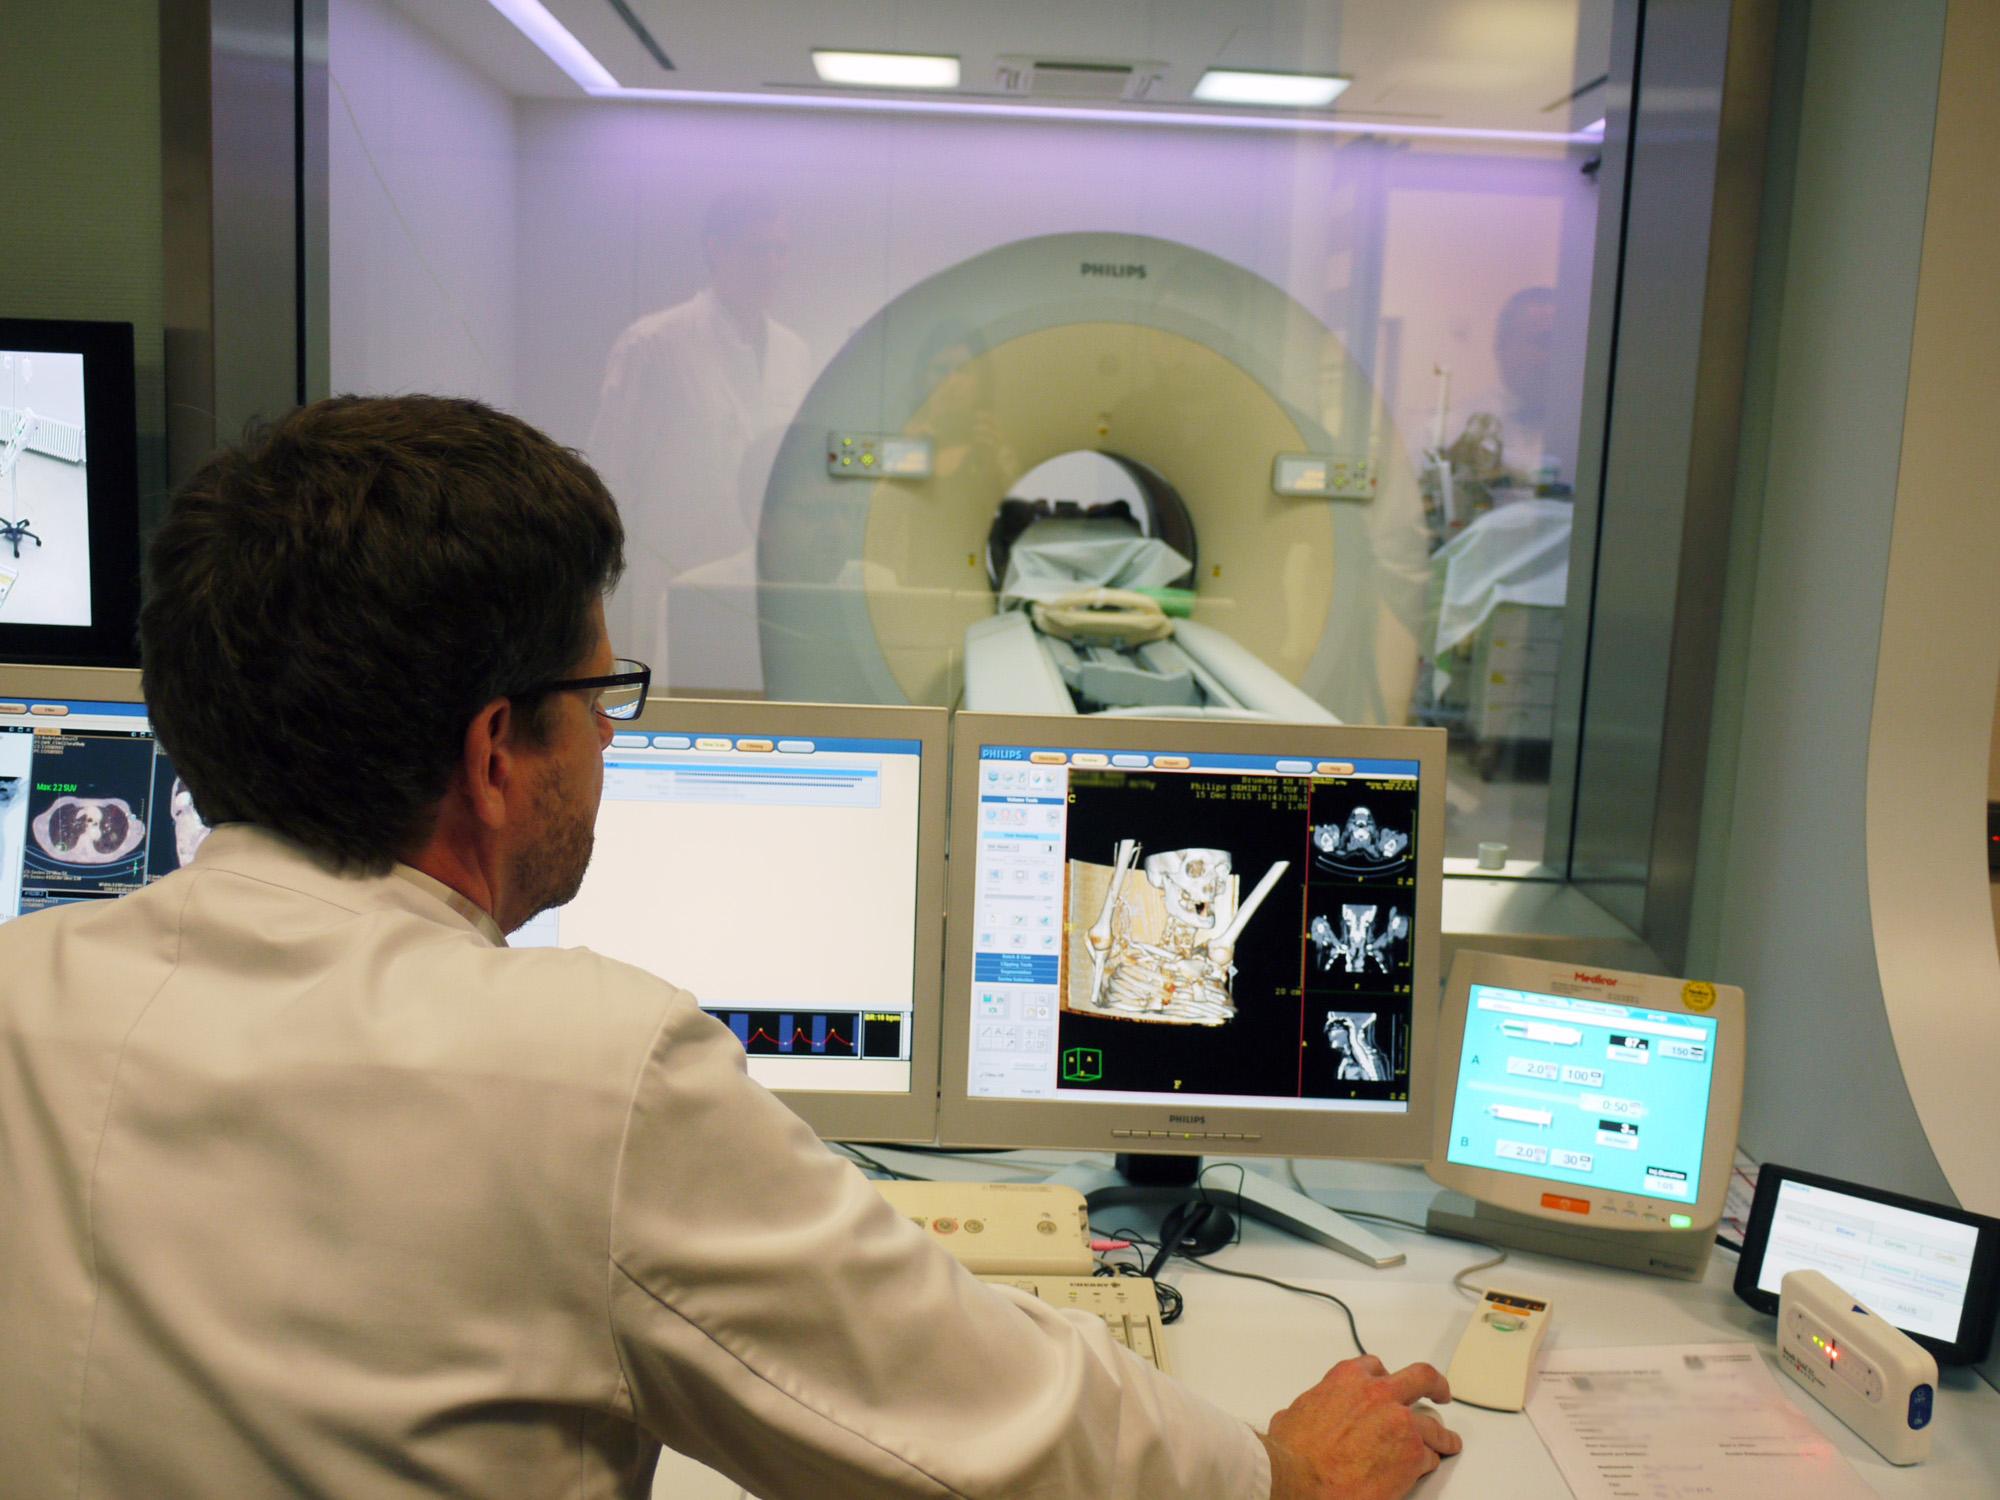 Radiologie und Nuklearmedizin / Brüderkrankenhaus St. Josef Paderborn